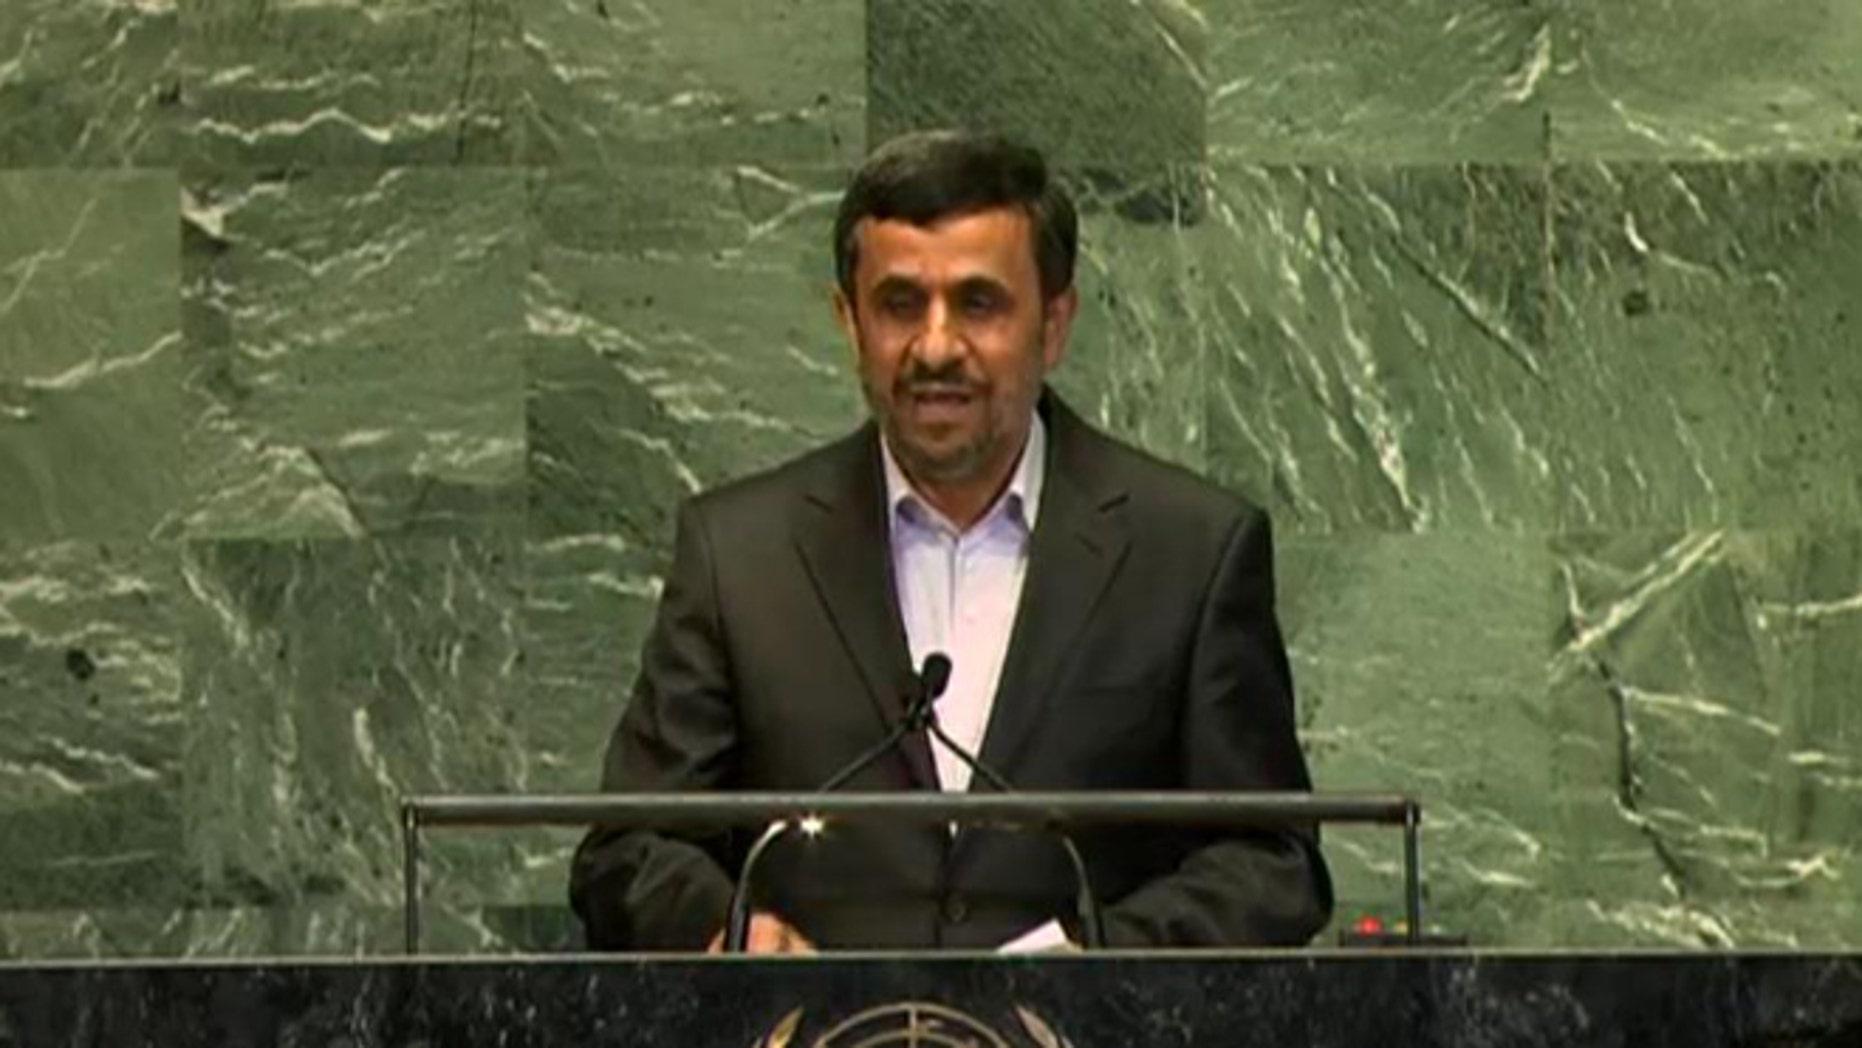 Sept. 24, 2012: Iranian President Mahmoud Ahmadinejad addresses the UN's high-level meeting on the rule of law.